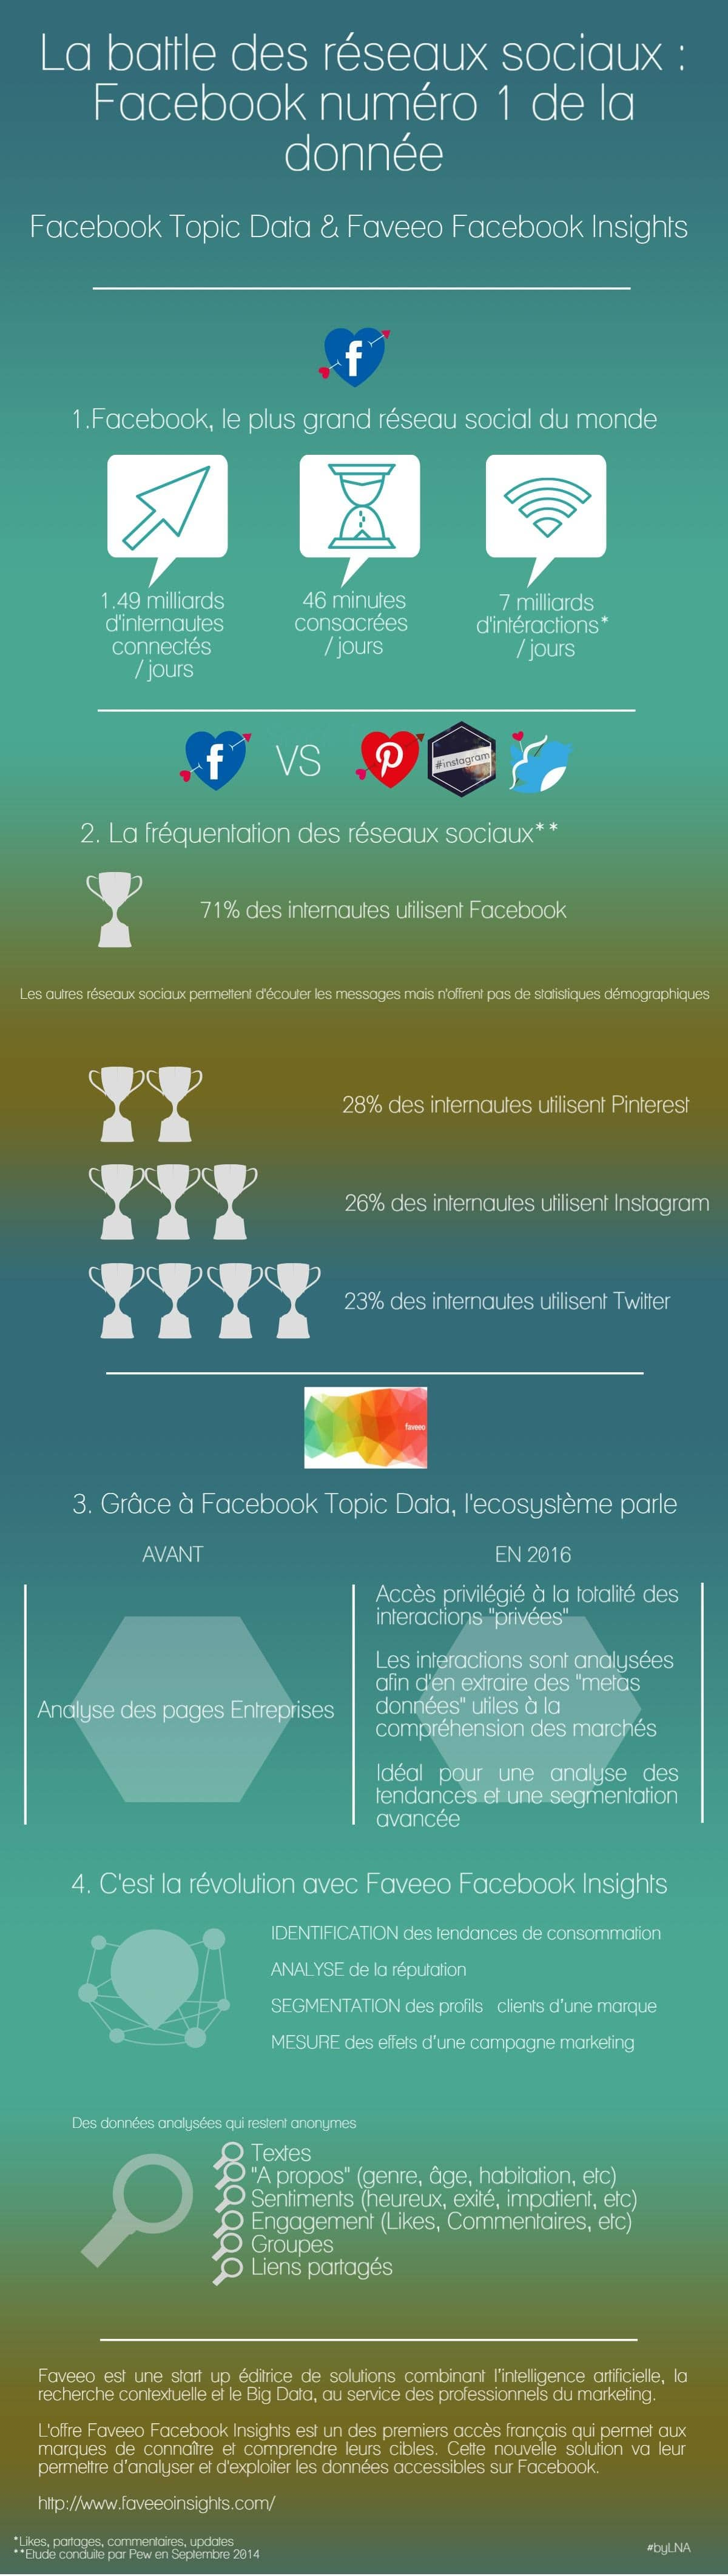 Infographie_FaveeoFacebookInsights